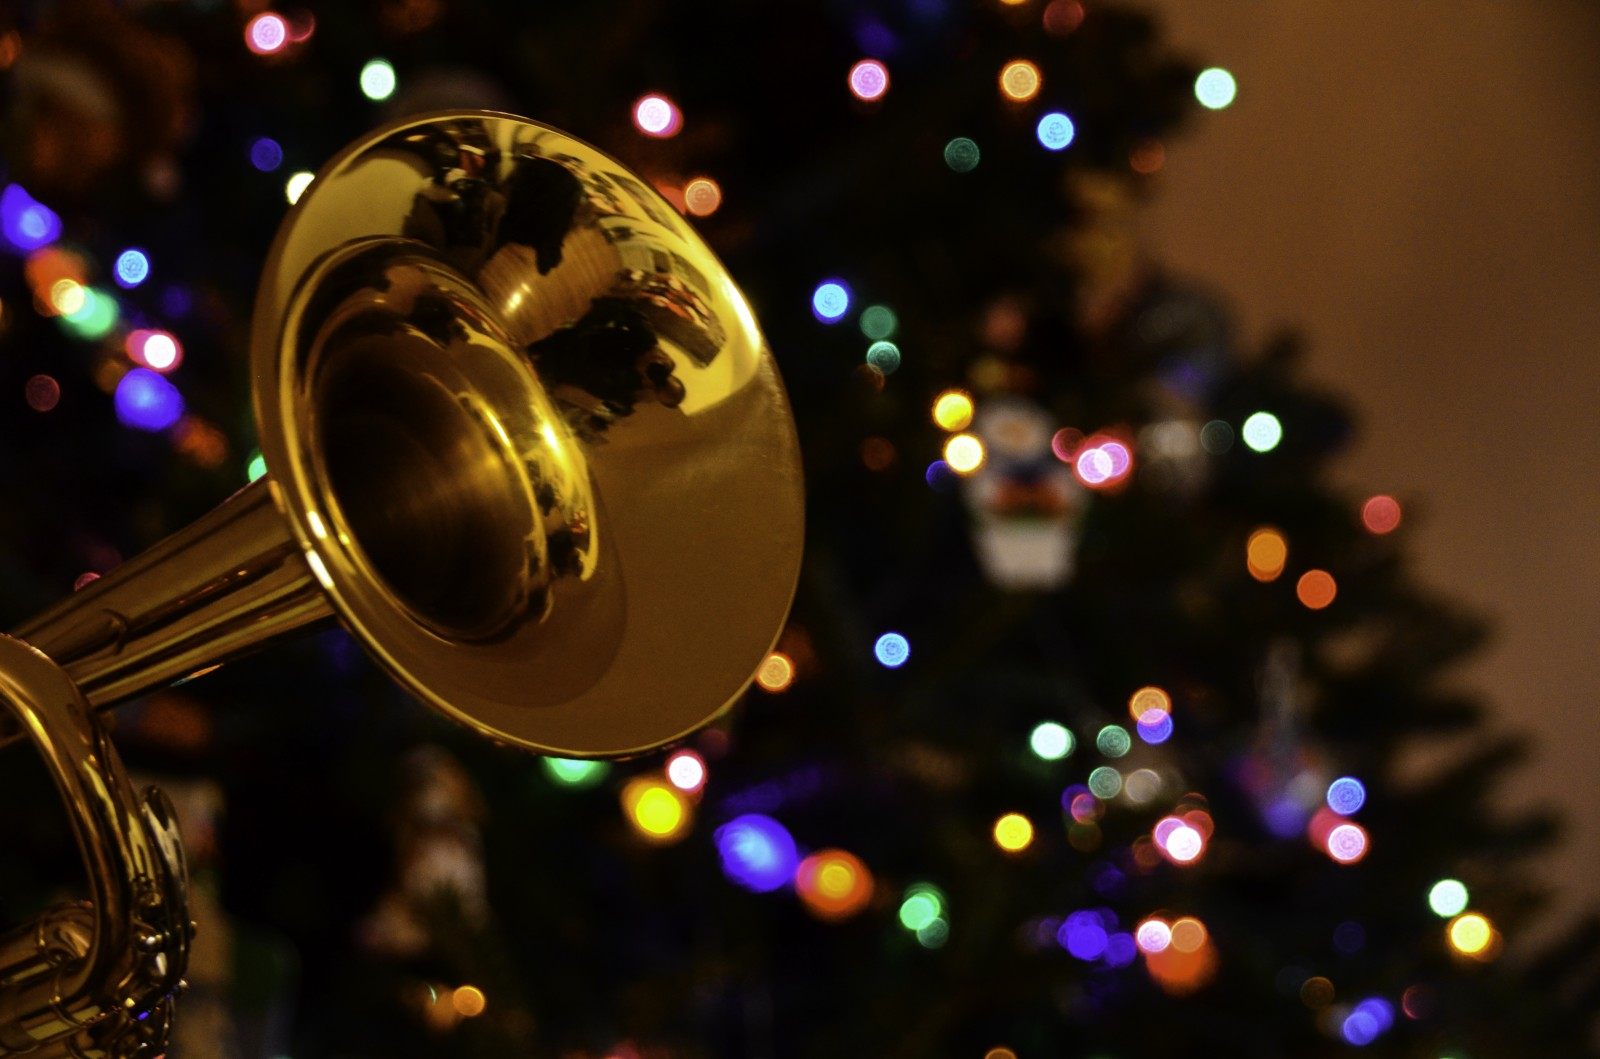 Presenting also  Gulf Coast Brass :  Danny Wilson, Trumpet, Andrew Wilson, Trumpet, Thomas Bacon, French Horn, Rick White, Trombone, David Kirk, Tuba